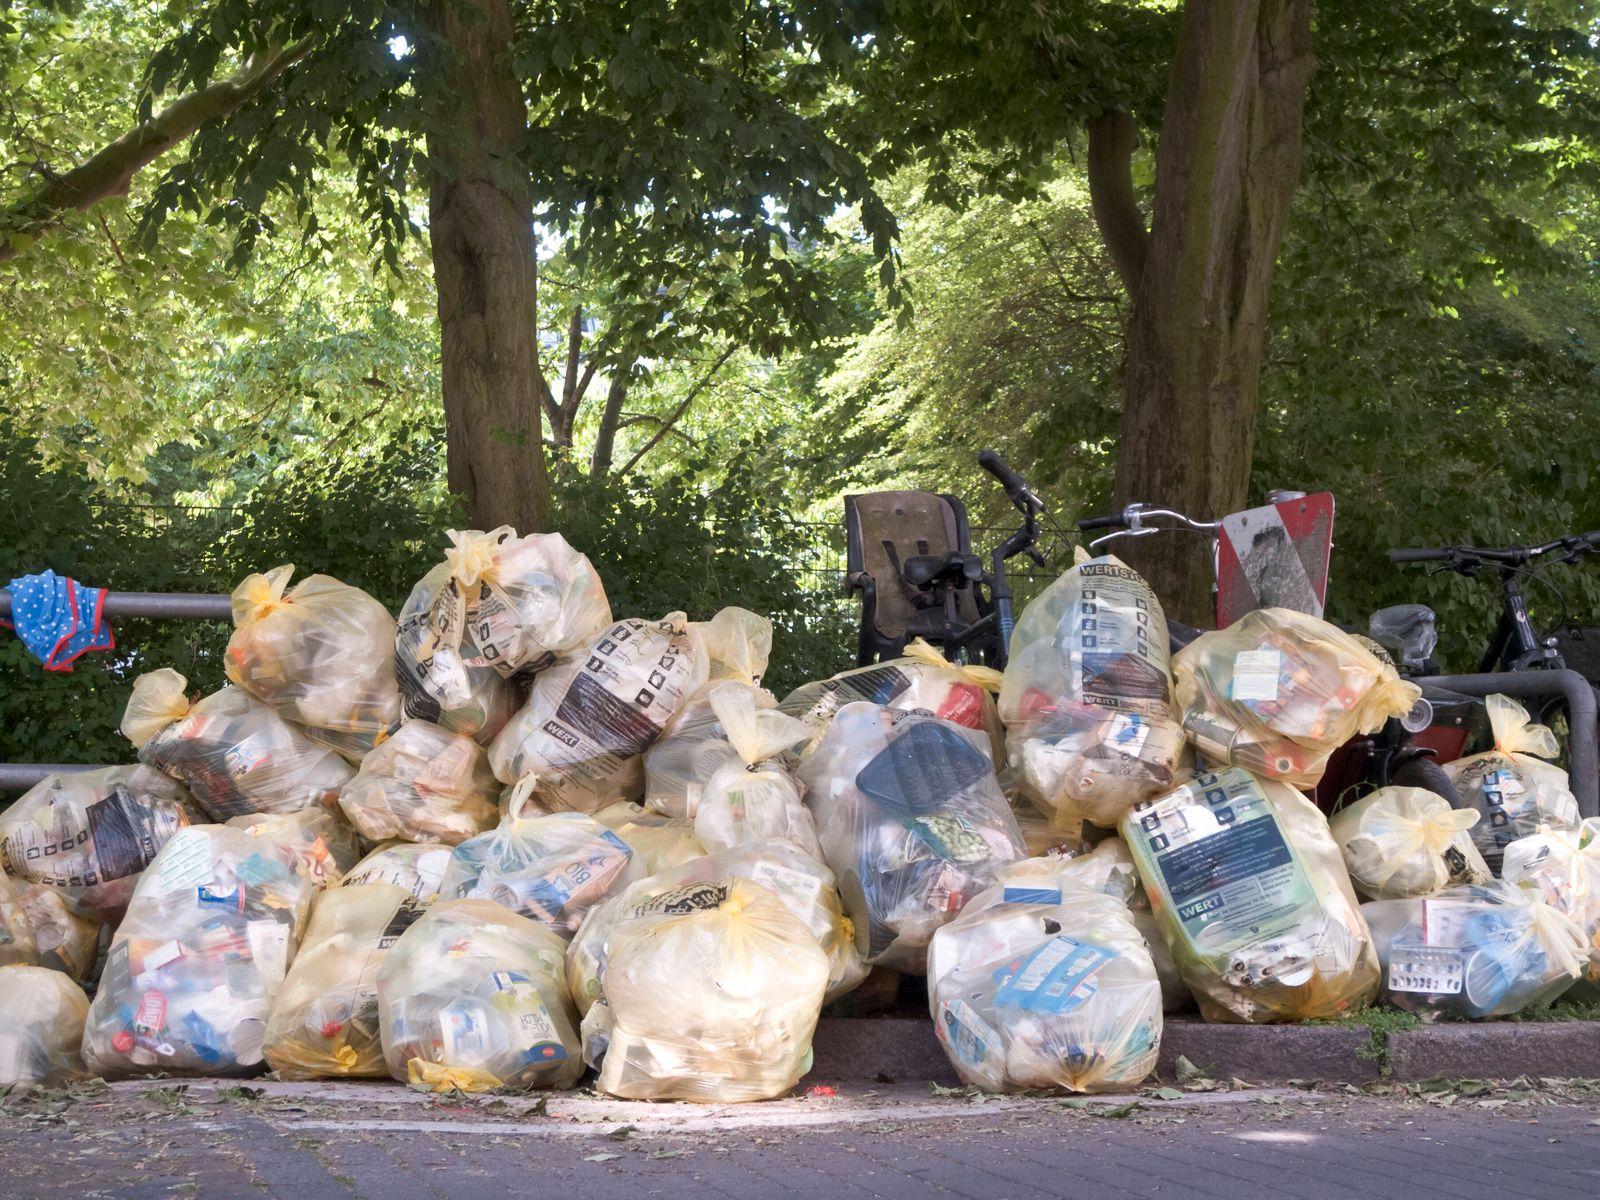 Gelbe Säcke im Wohngebiet Duales System Gelber Sack Grüner Punkt Recycling Wertstoffrecycling Plastikabfall Plastikmüll